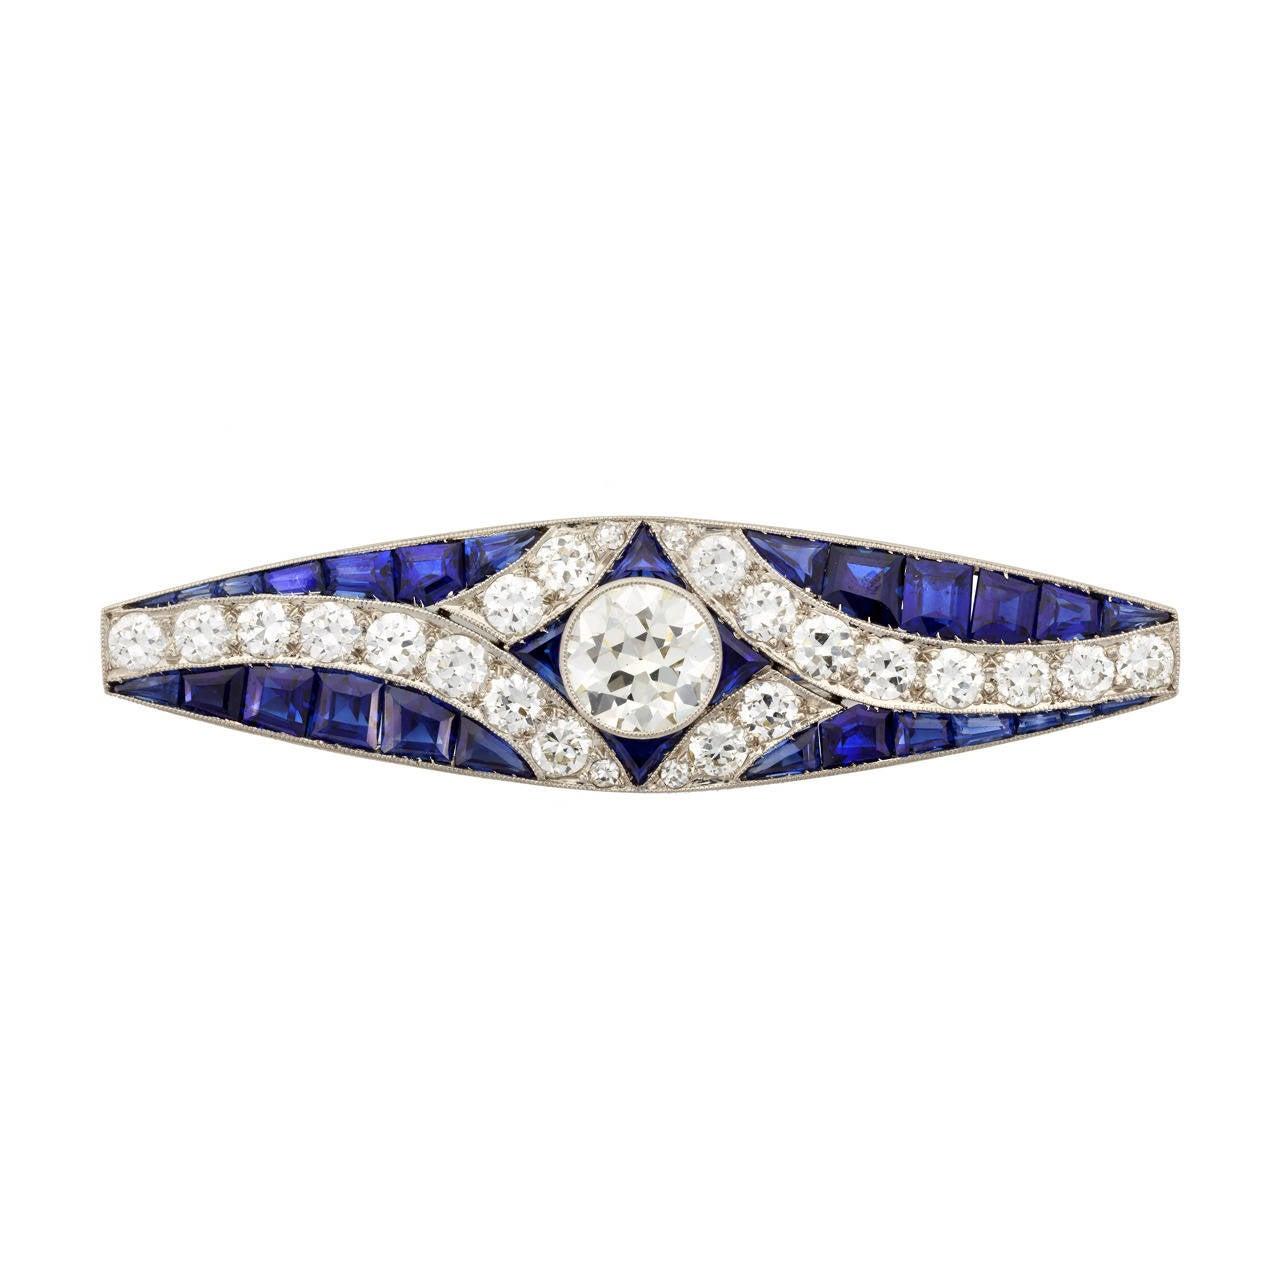 Art Deco Bar Pin with Calibre-Cut Sapphires and Diamonds